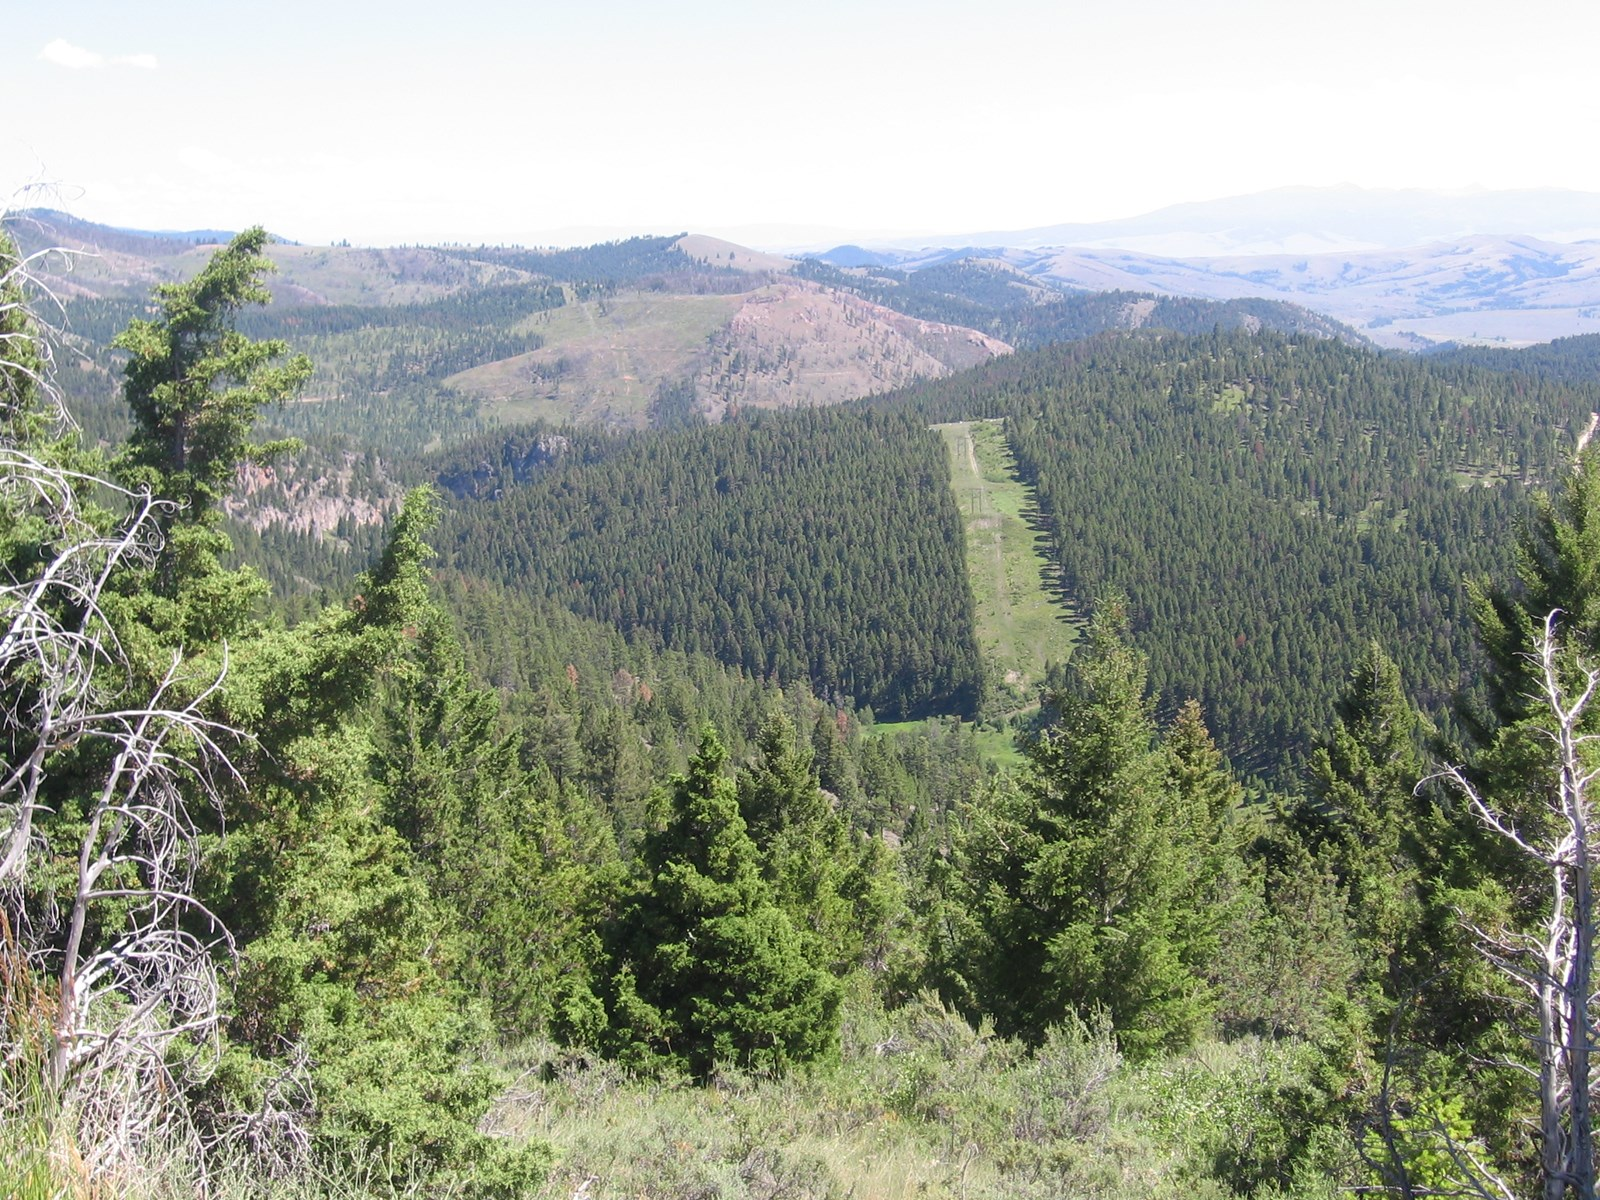 Rural Residential Acreage In Drummond Montana